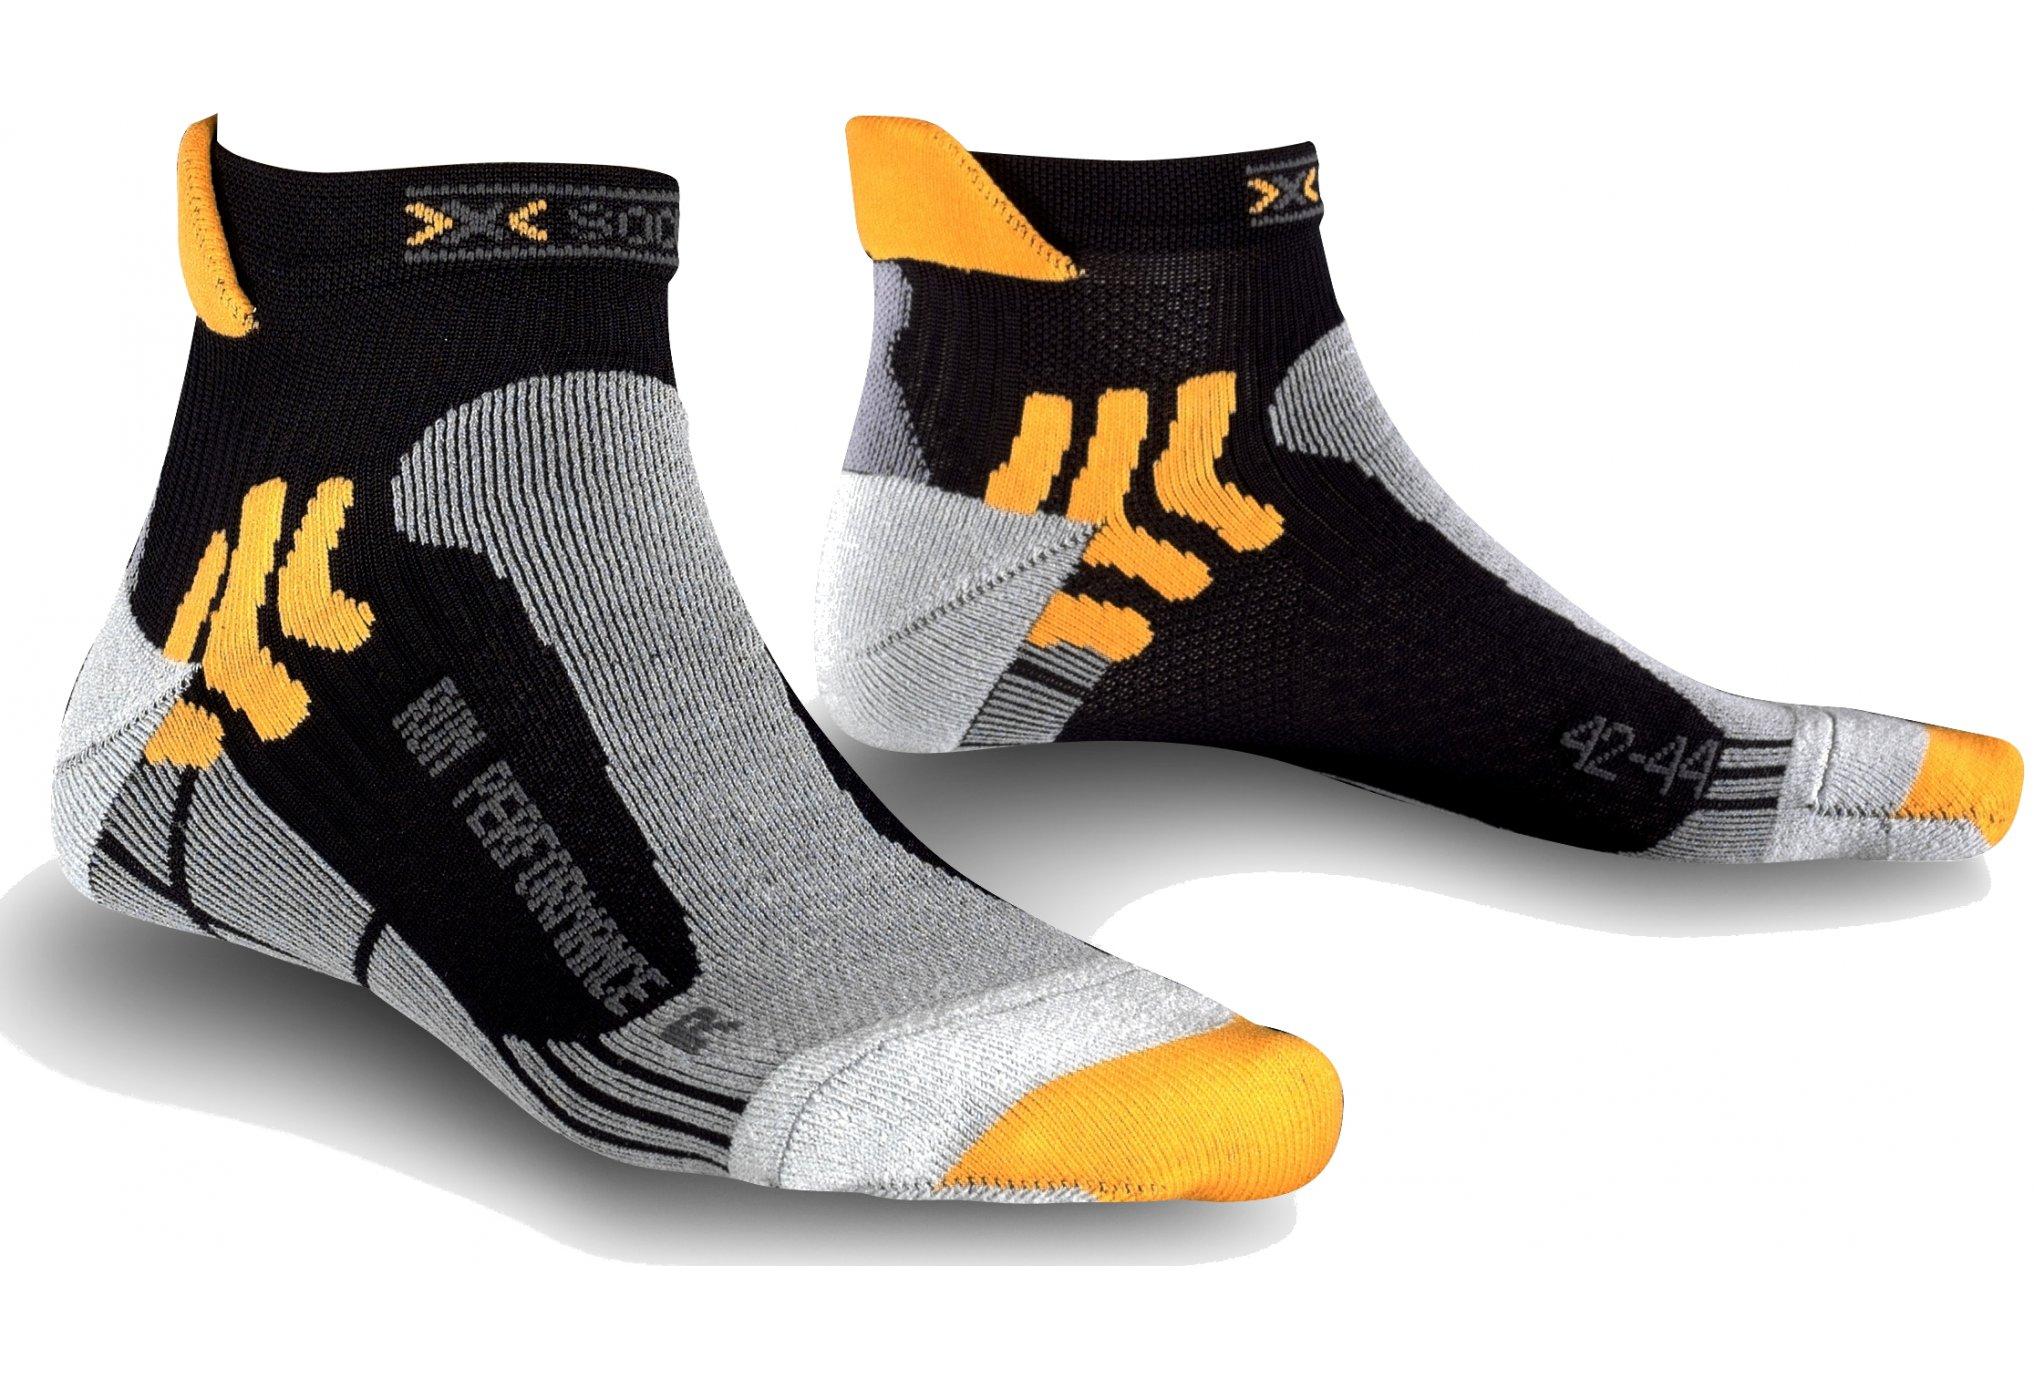 X-Socks Run Performance Chaussettes